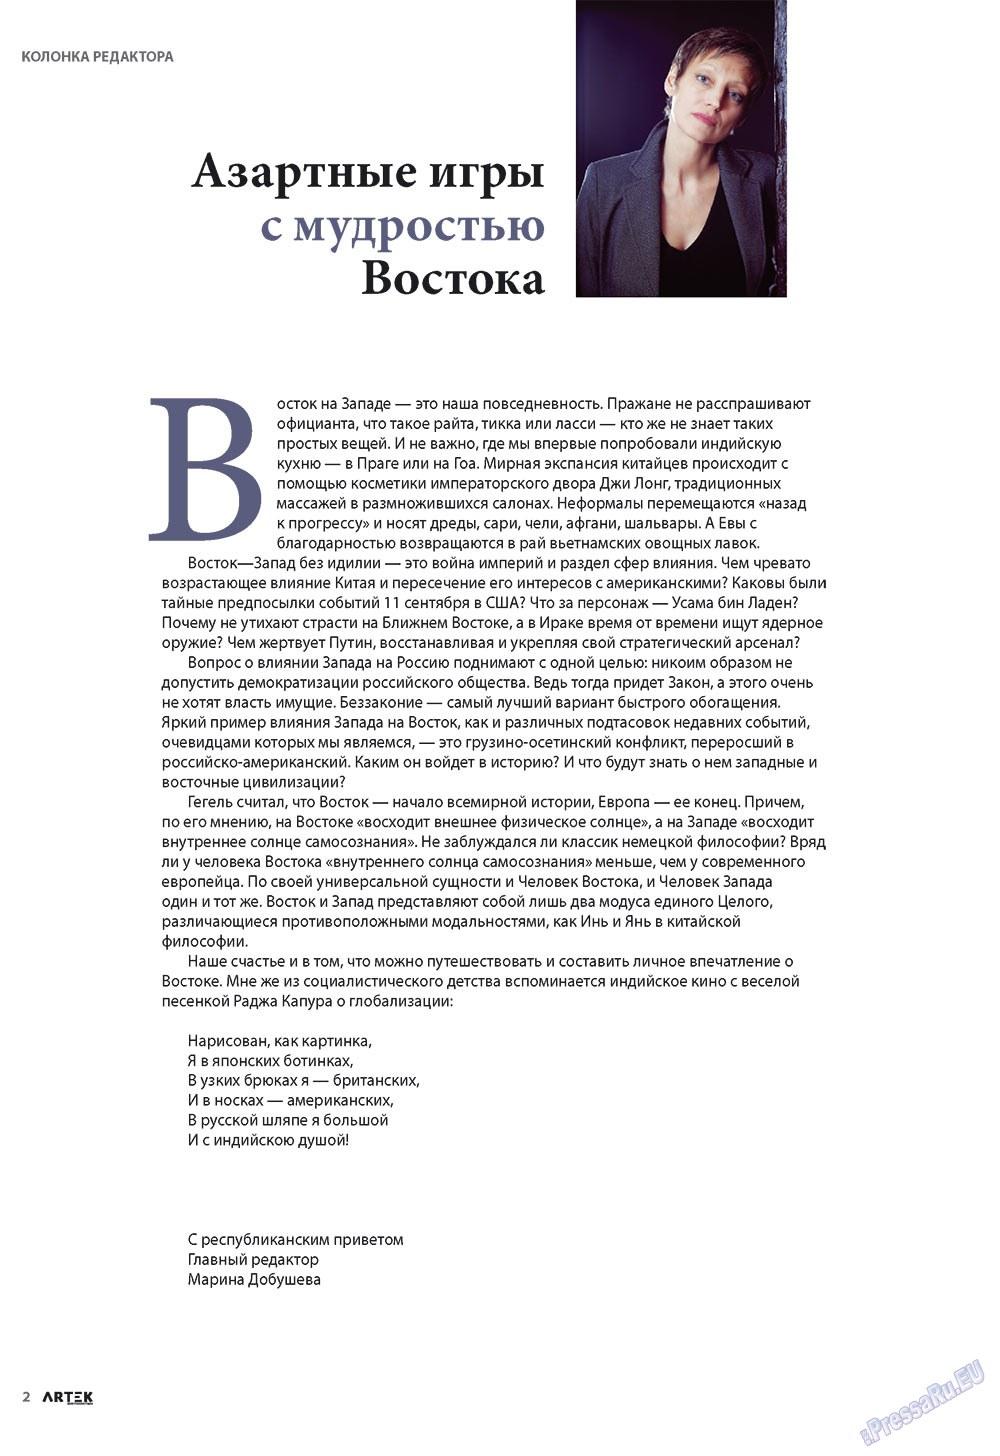 Артек (журнал). 2009 год, номер 5, стр. 2